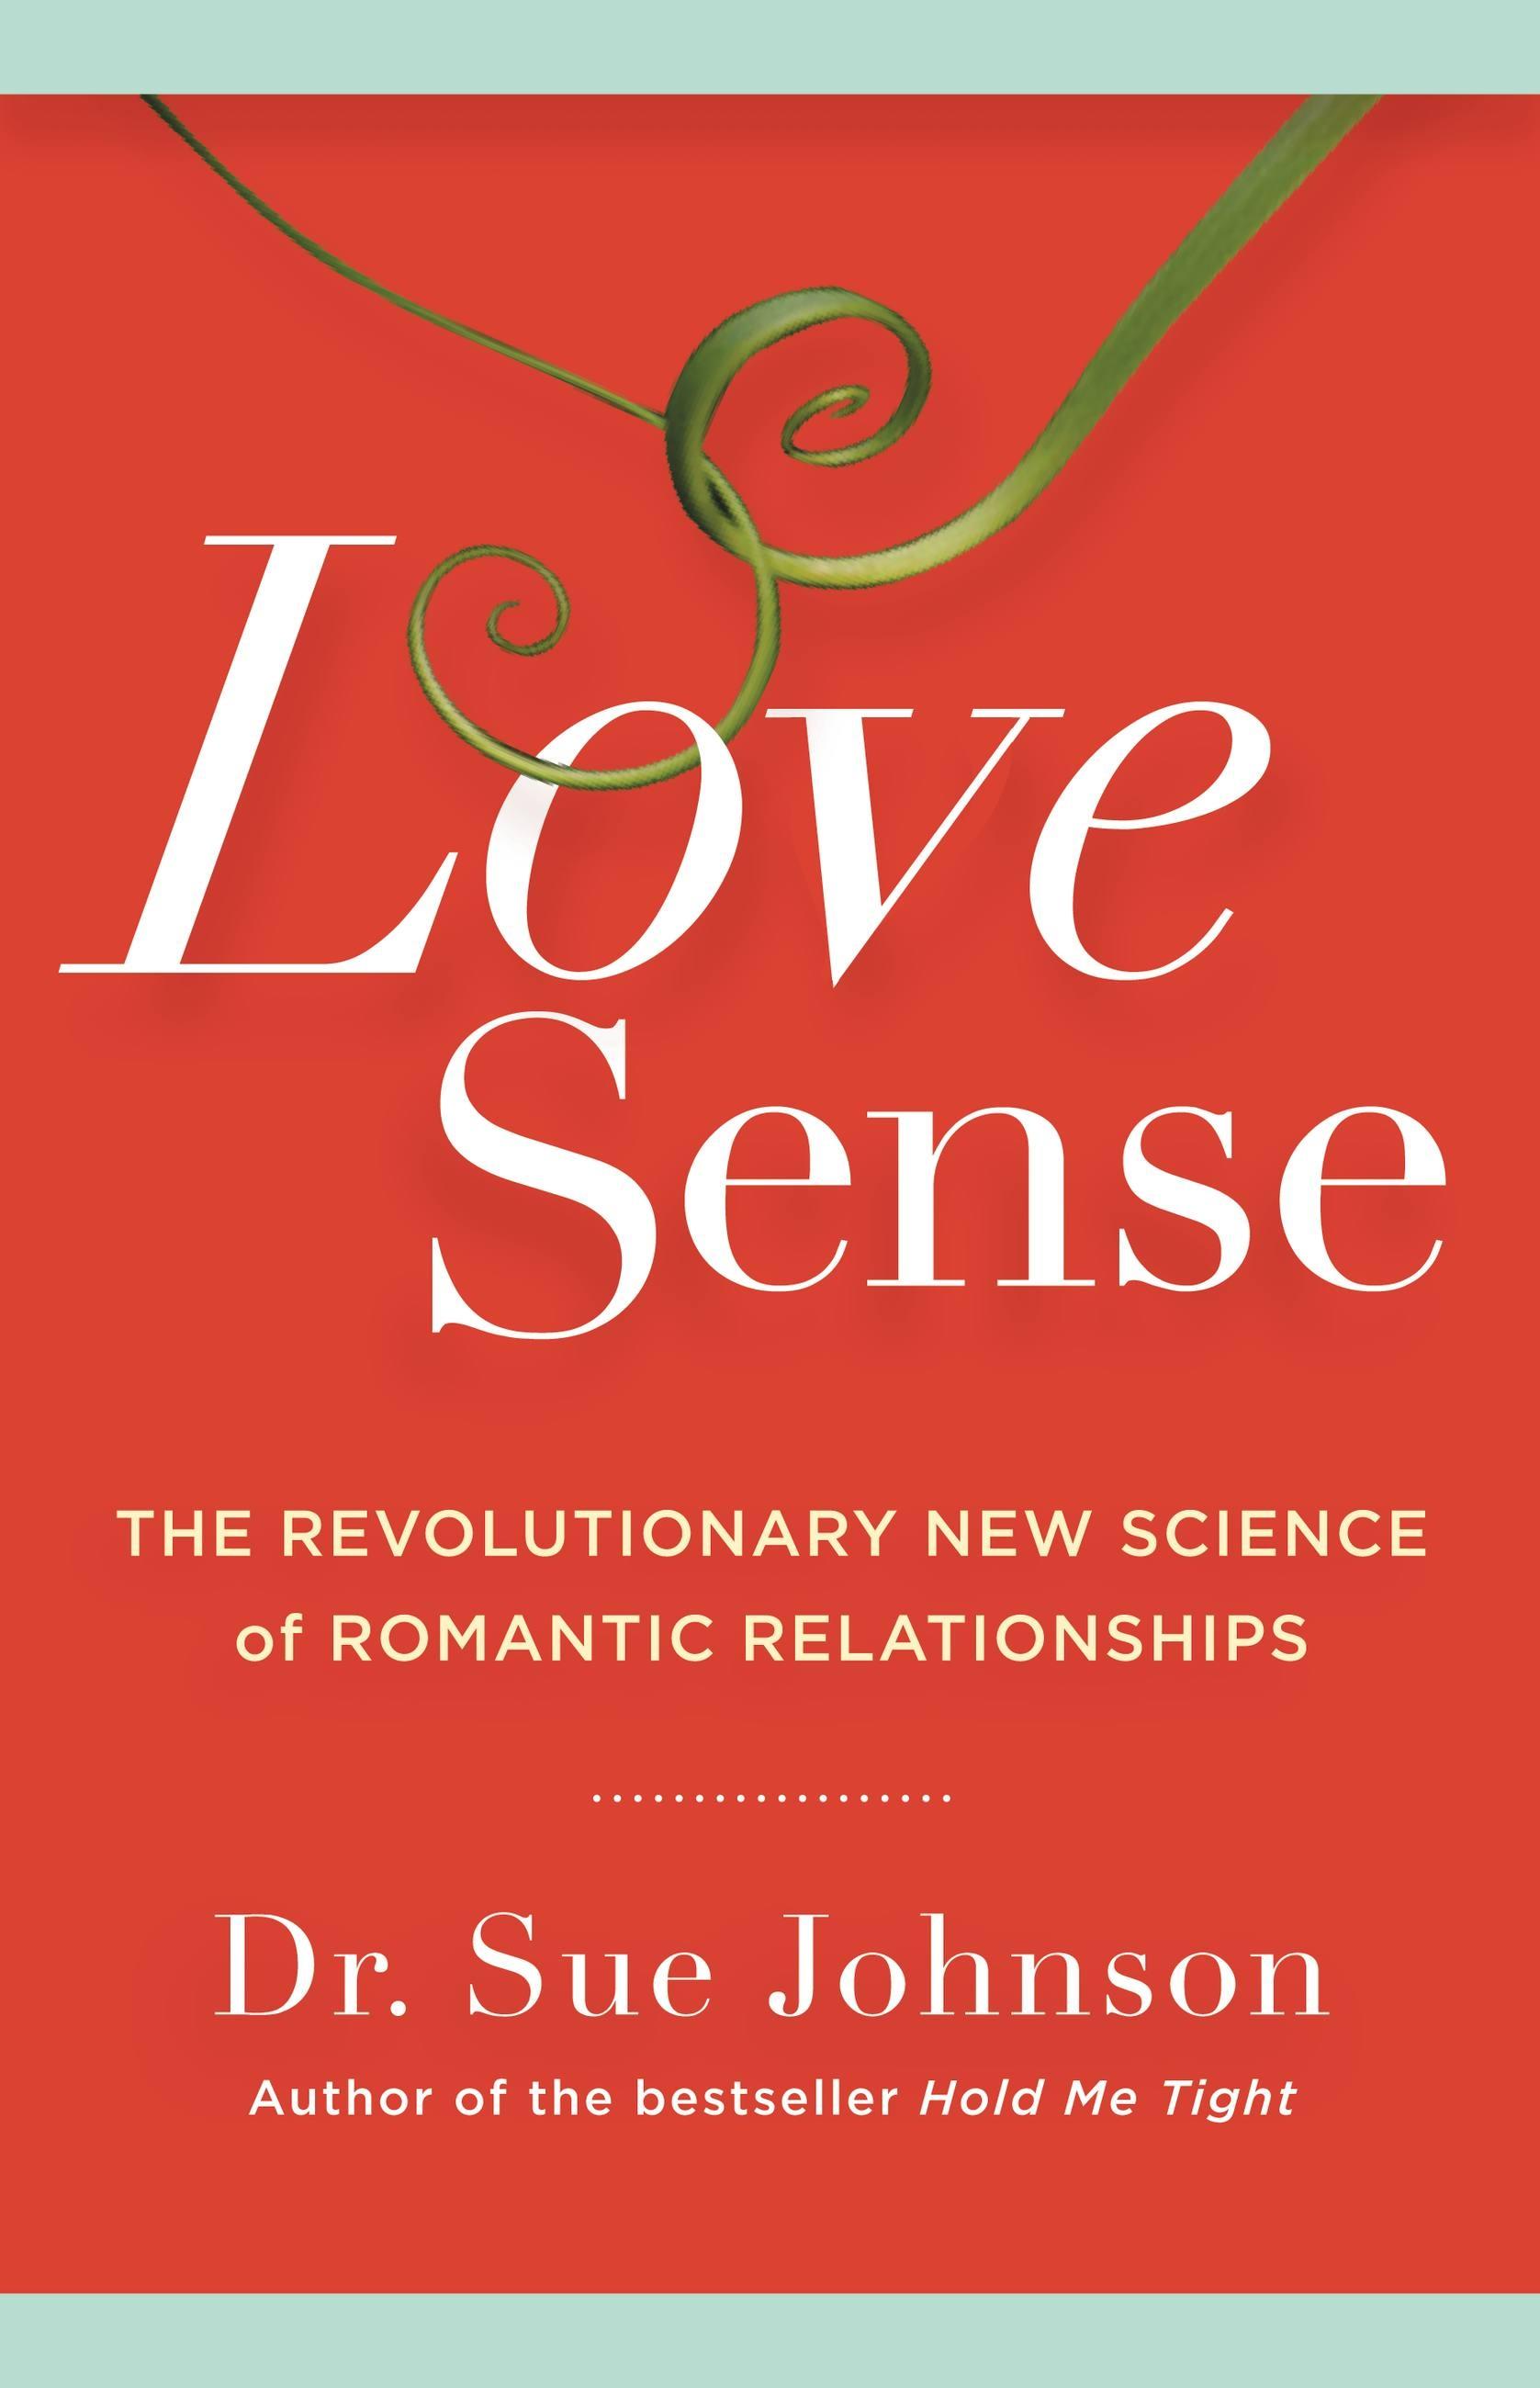 Love Sense by Sue Johnson | Hachette Book Group